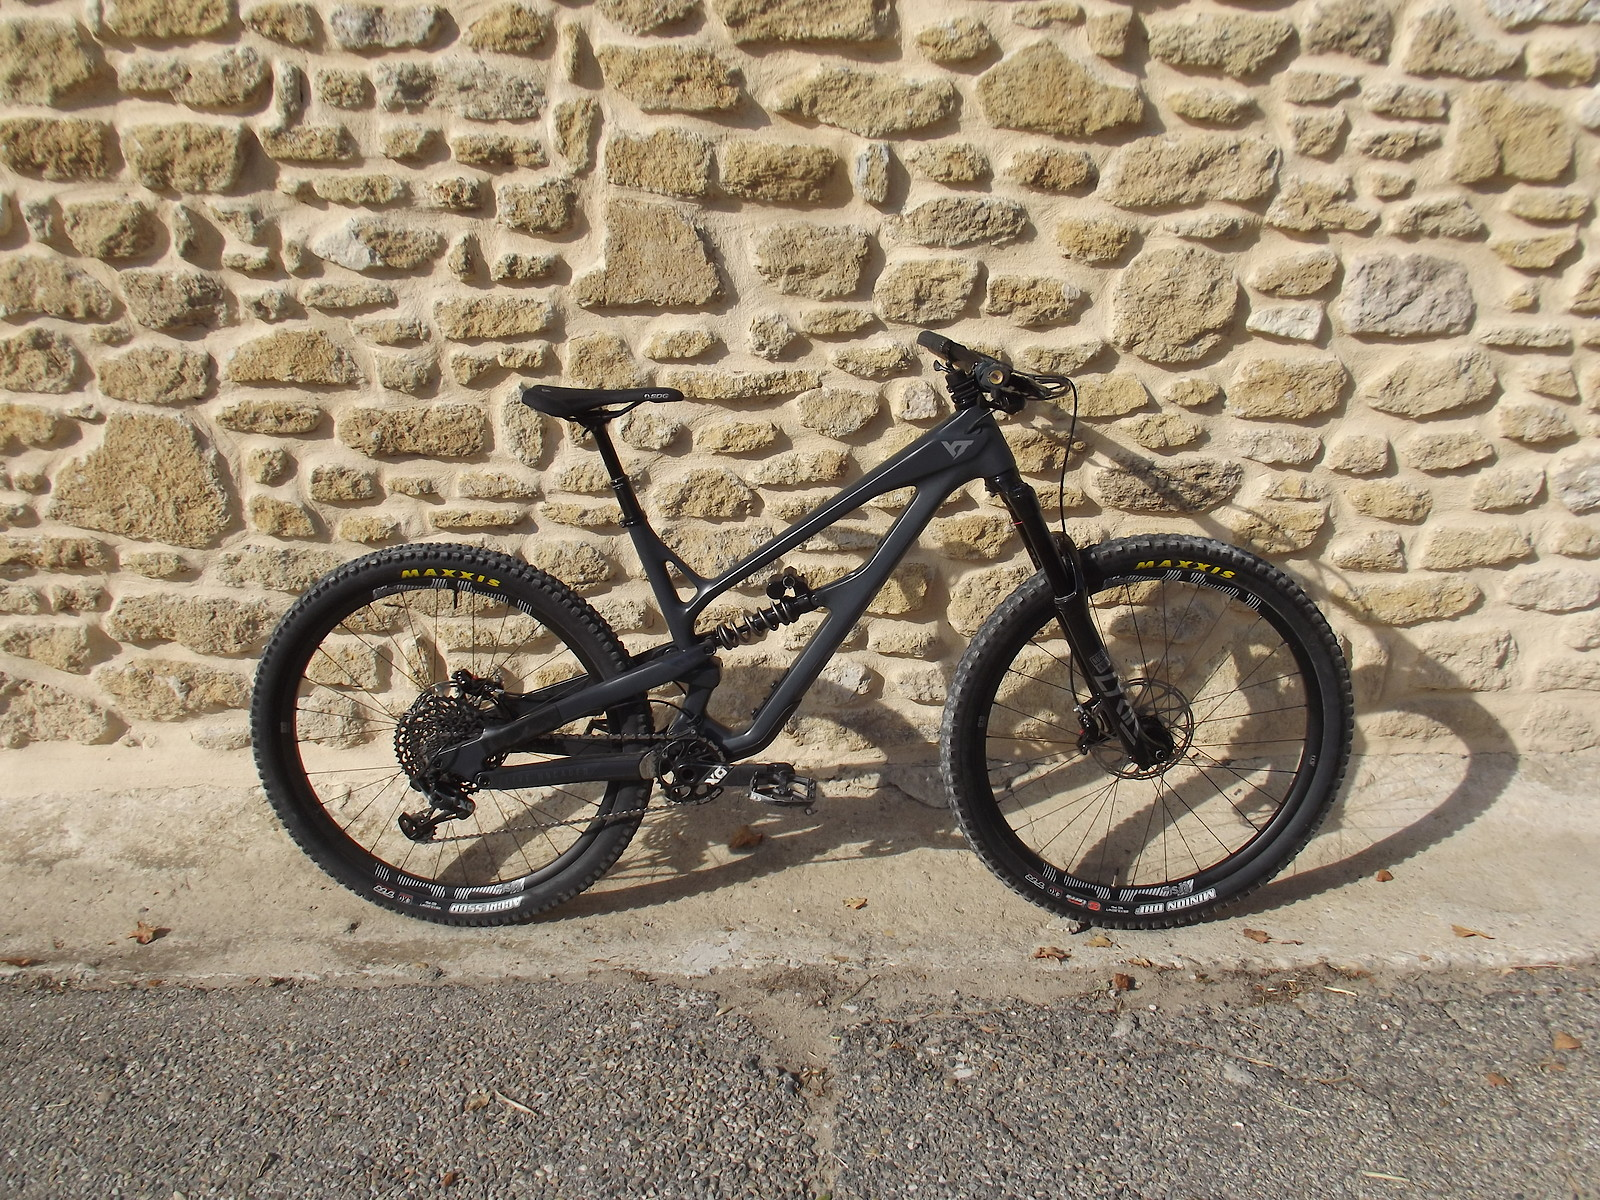 My new play bike